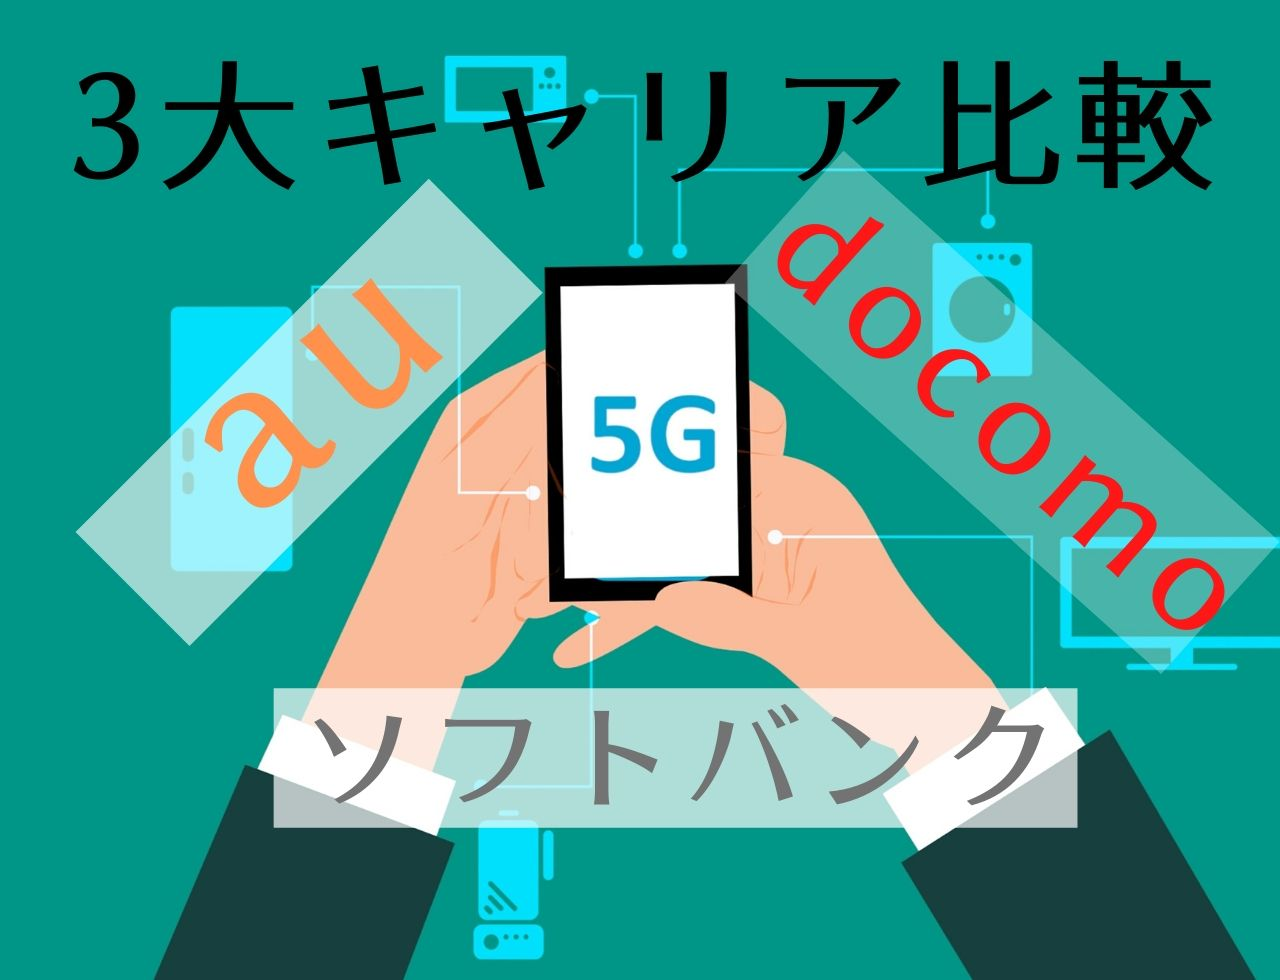 5Gサービス3大キャリア比較